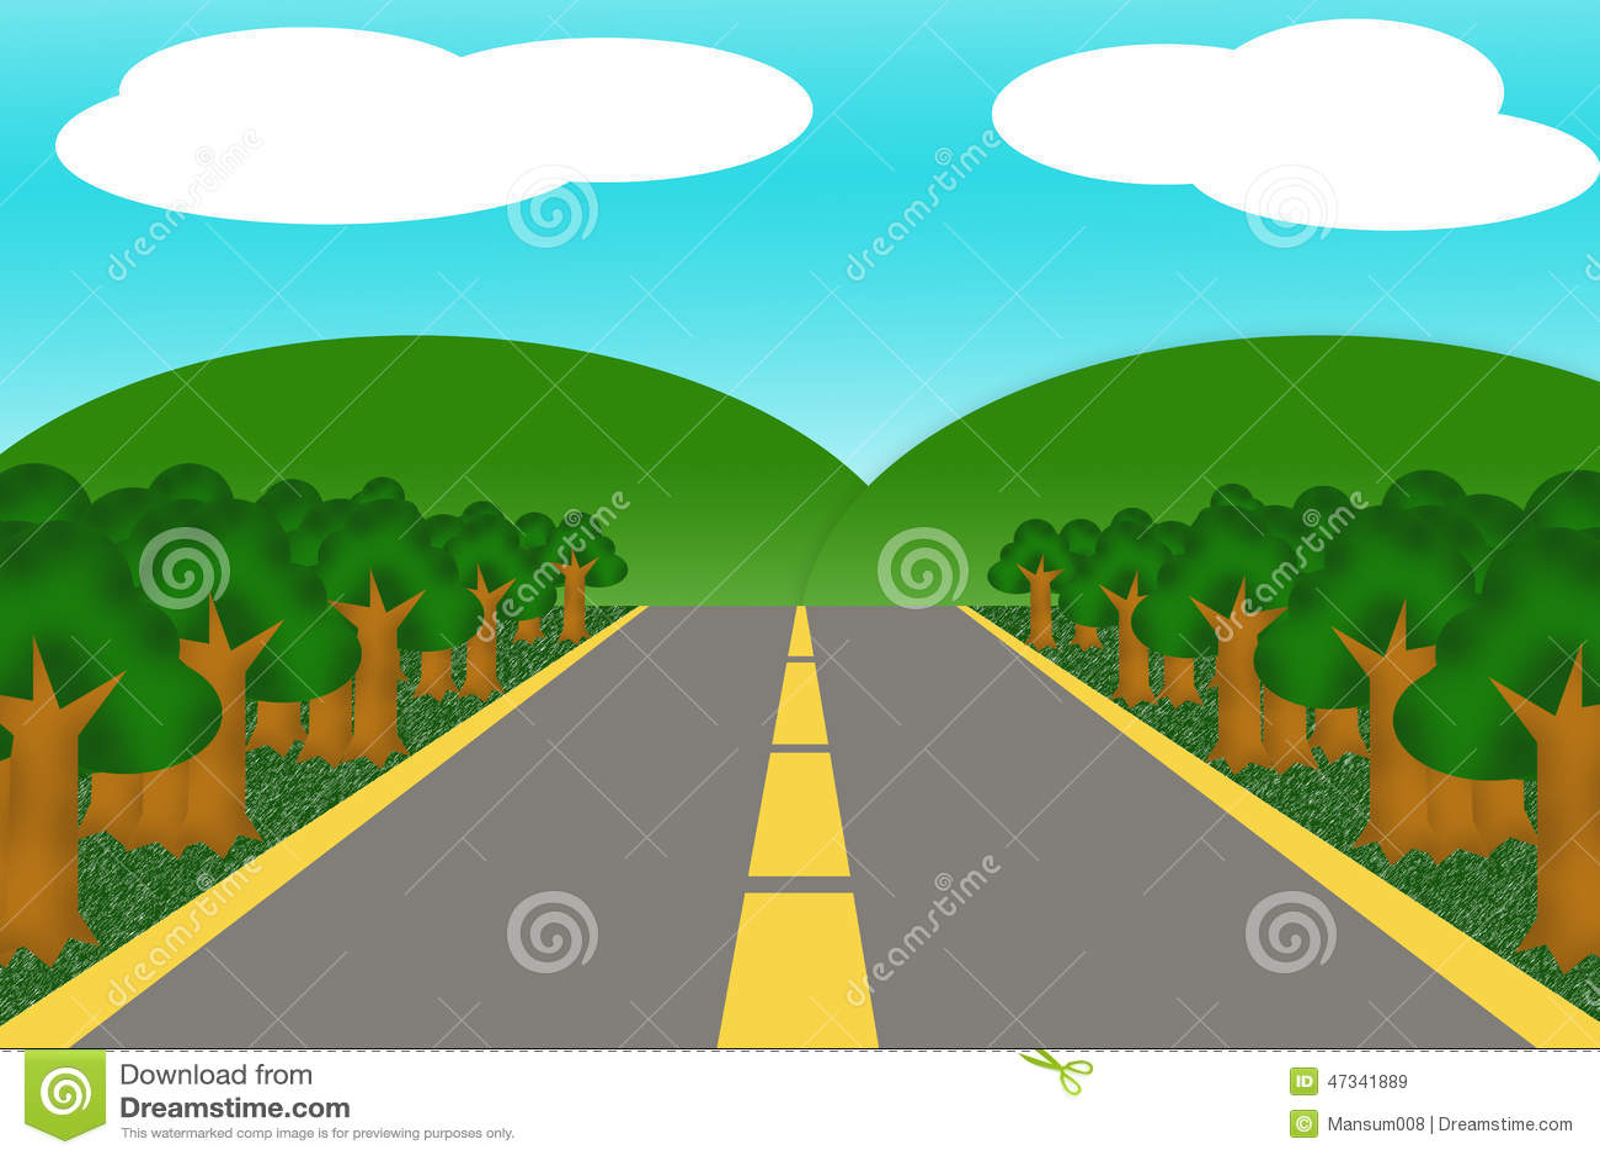 road cartoon stock illustration image 47341889